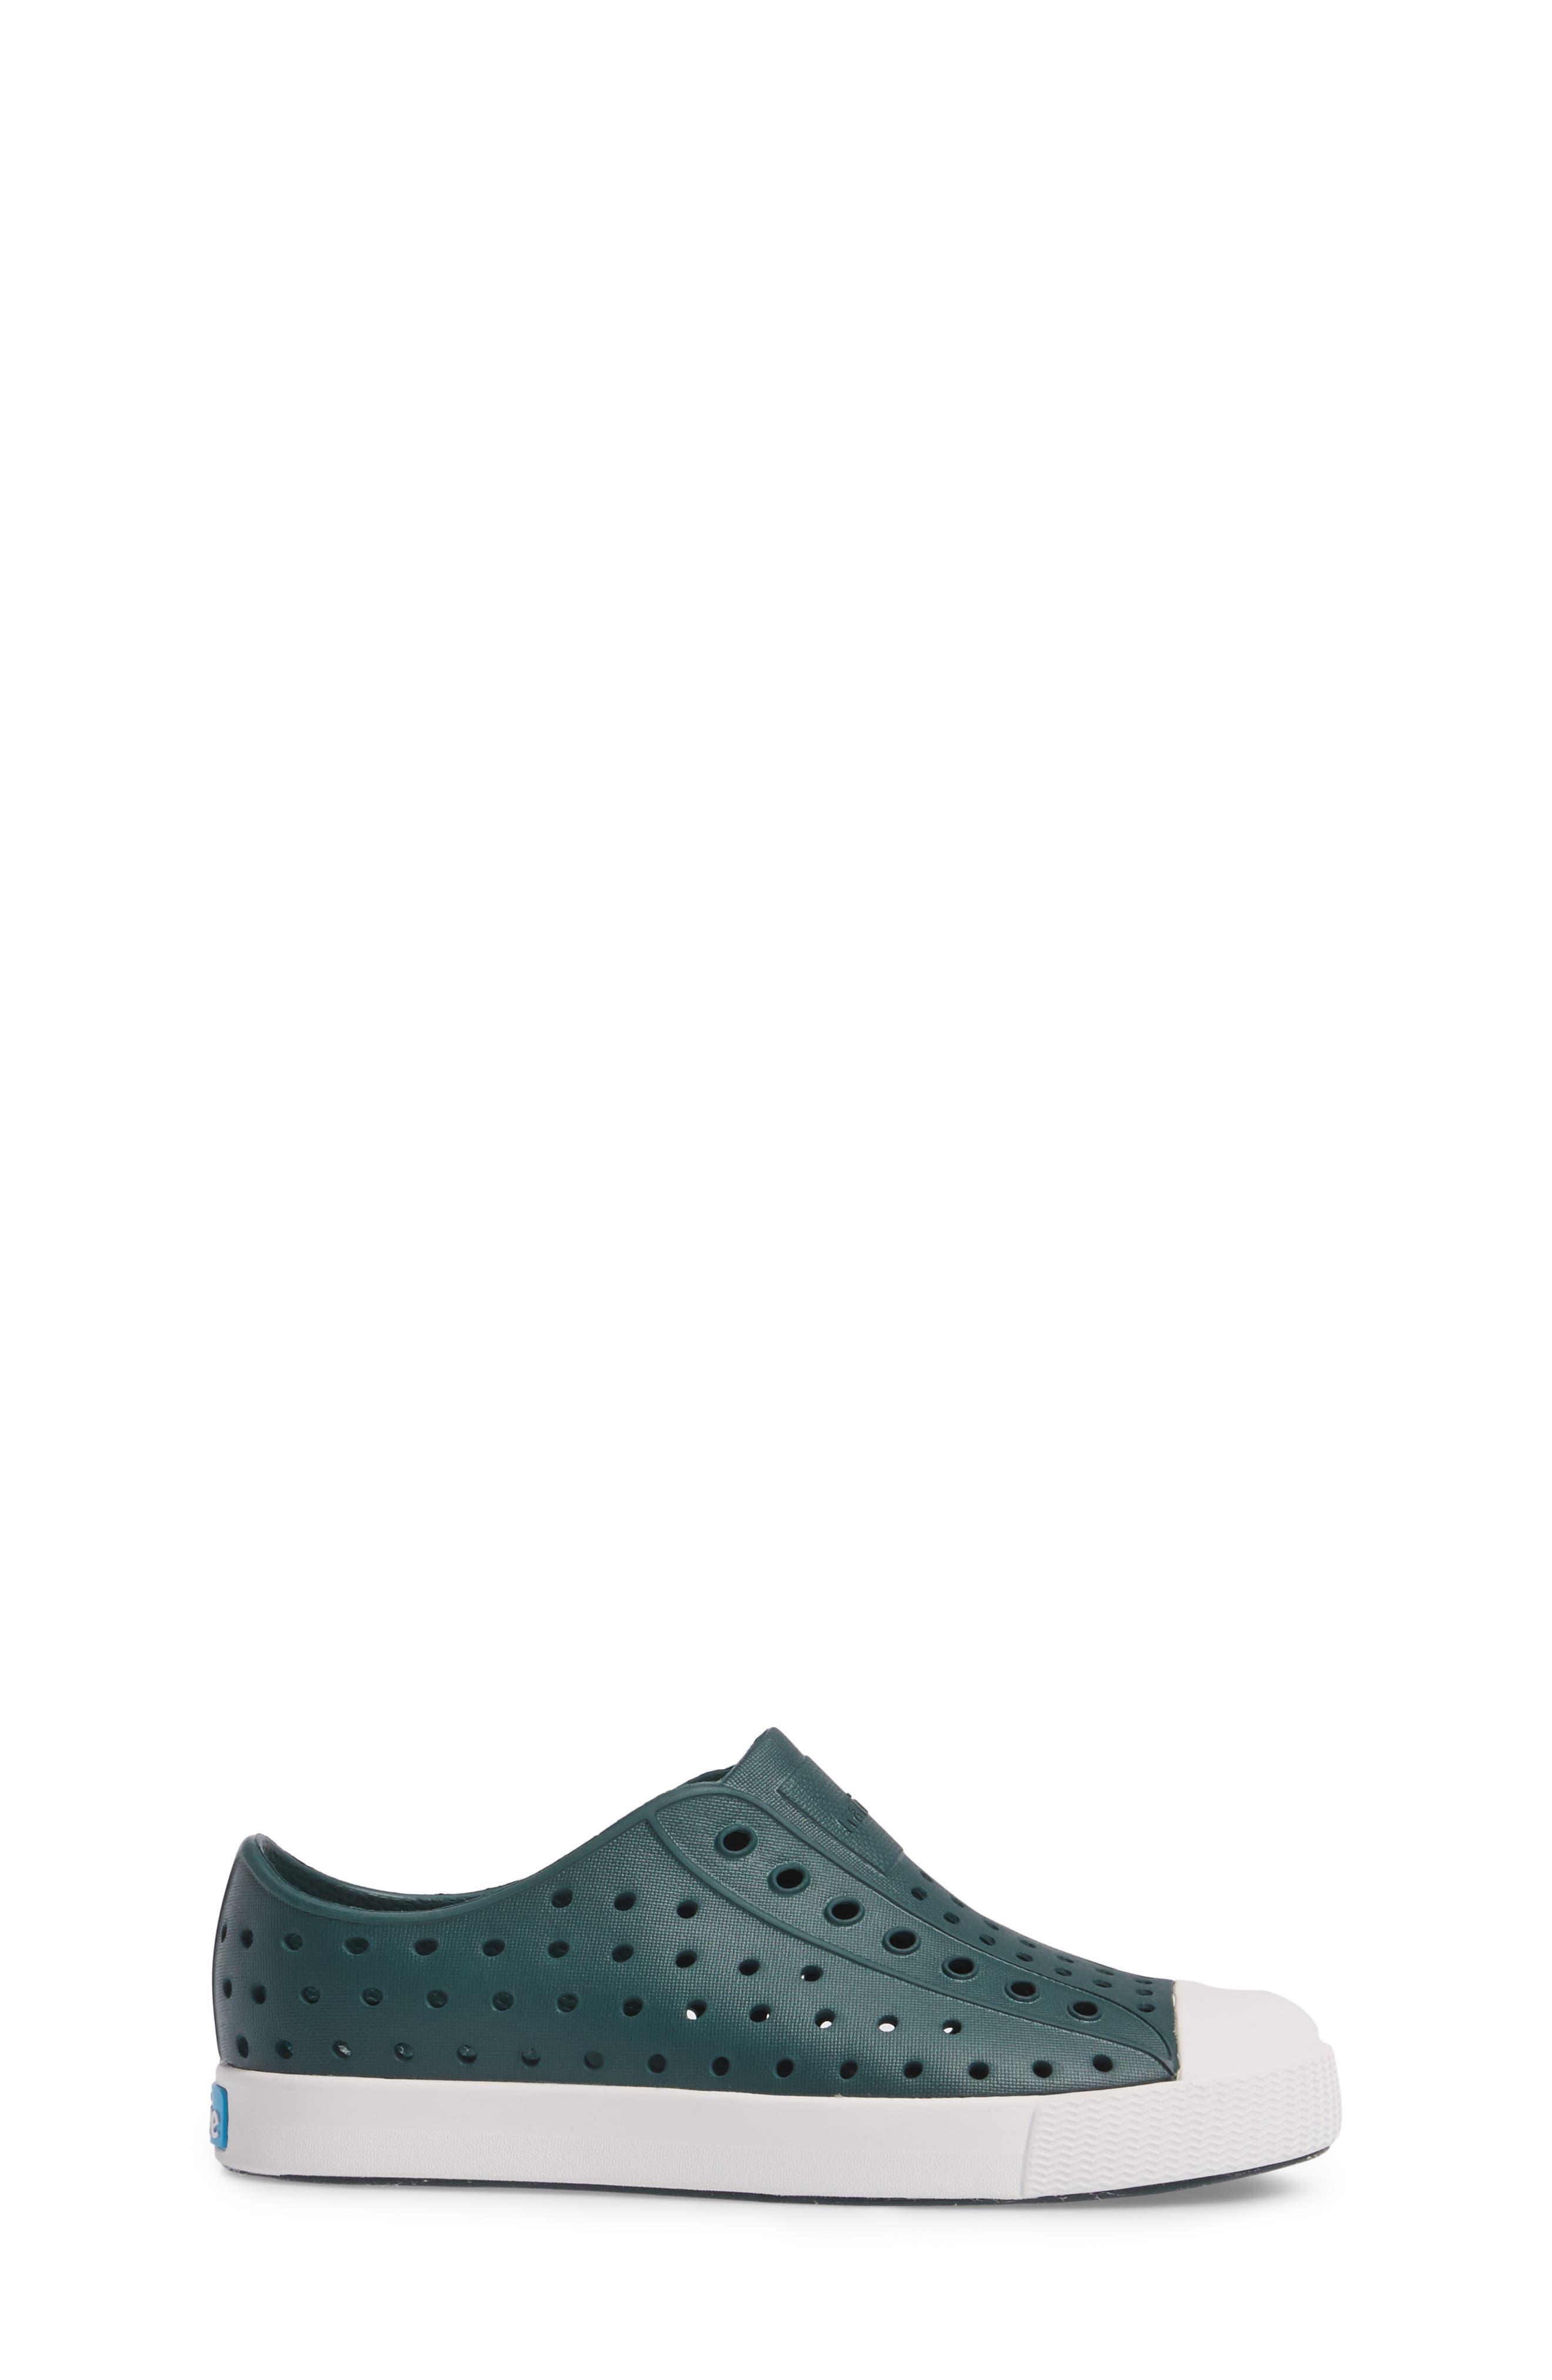 'Jefferson' Water Friendly Slip-On Sneaker,                             Alternate thumbnail 141, color,